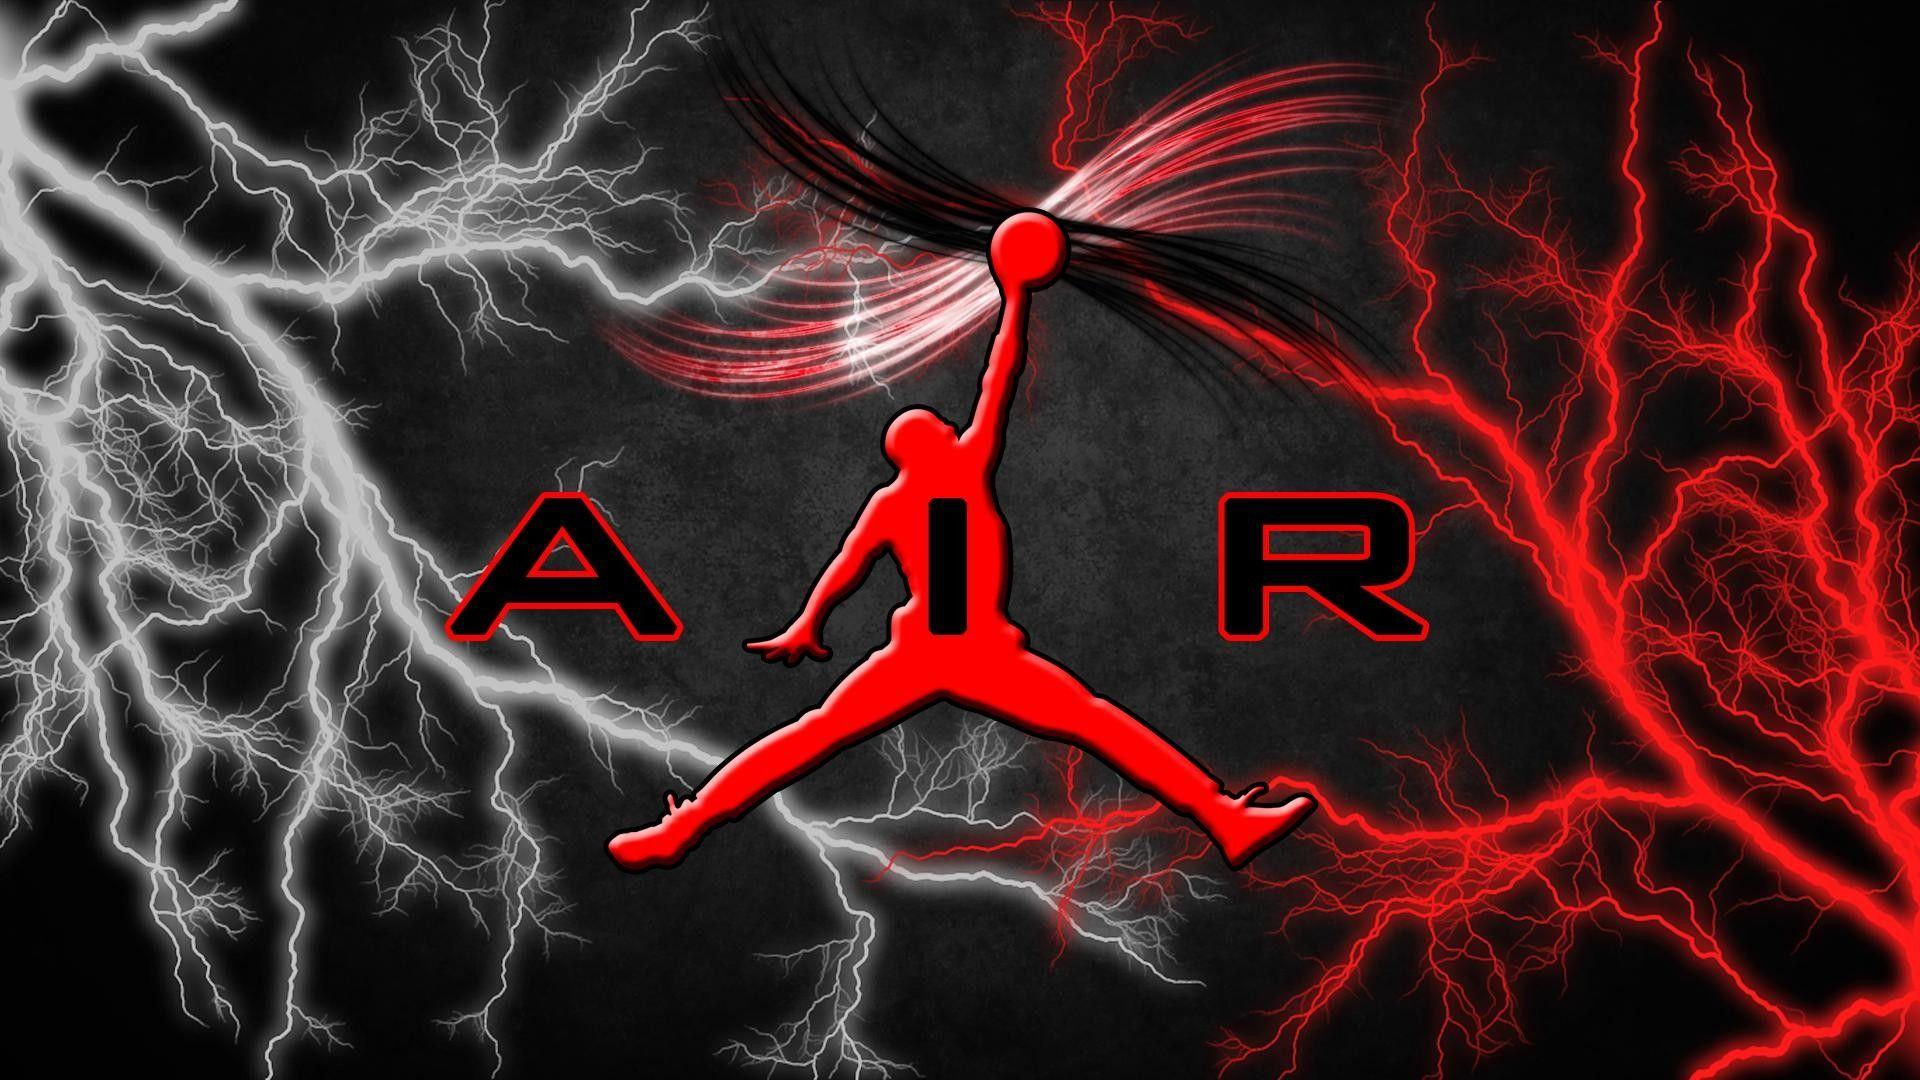 1920x1080 AirJordanLogowallpaperwp002210 Jordan logo